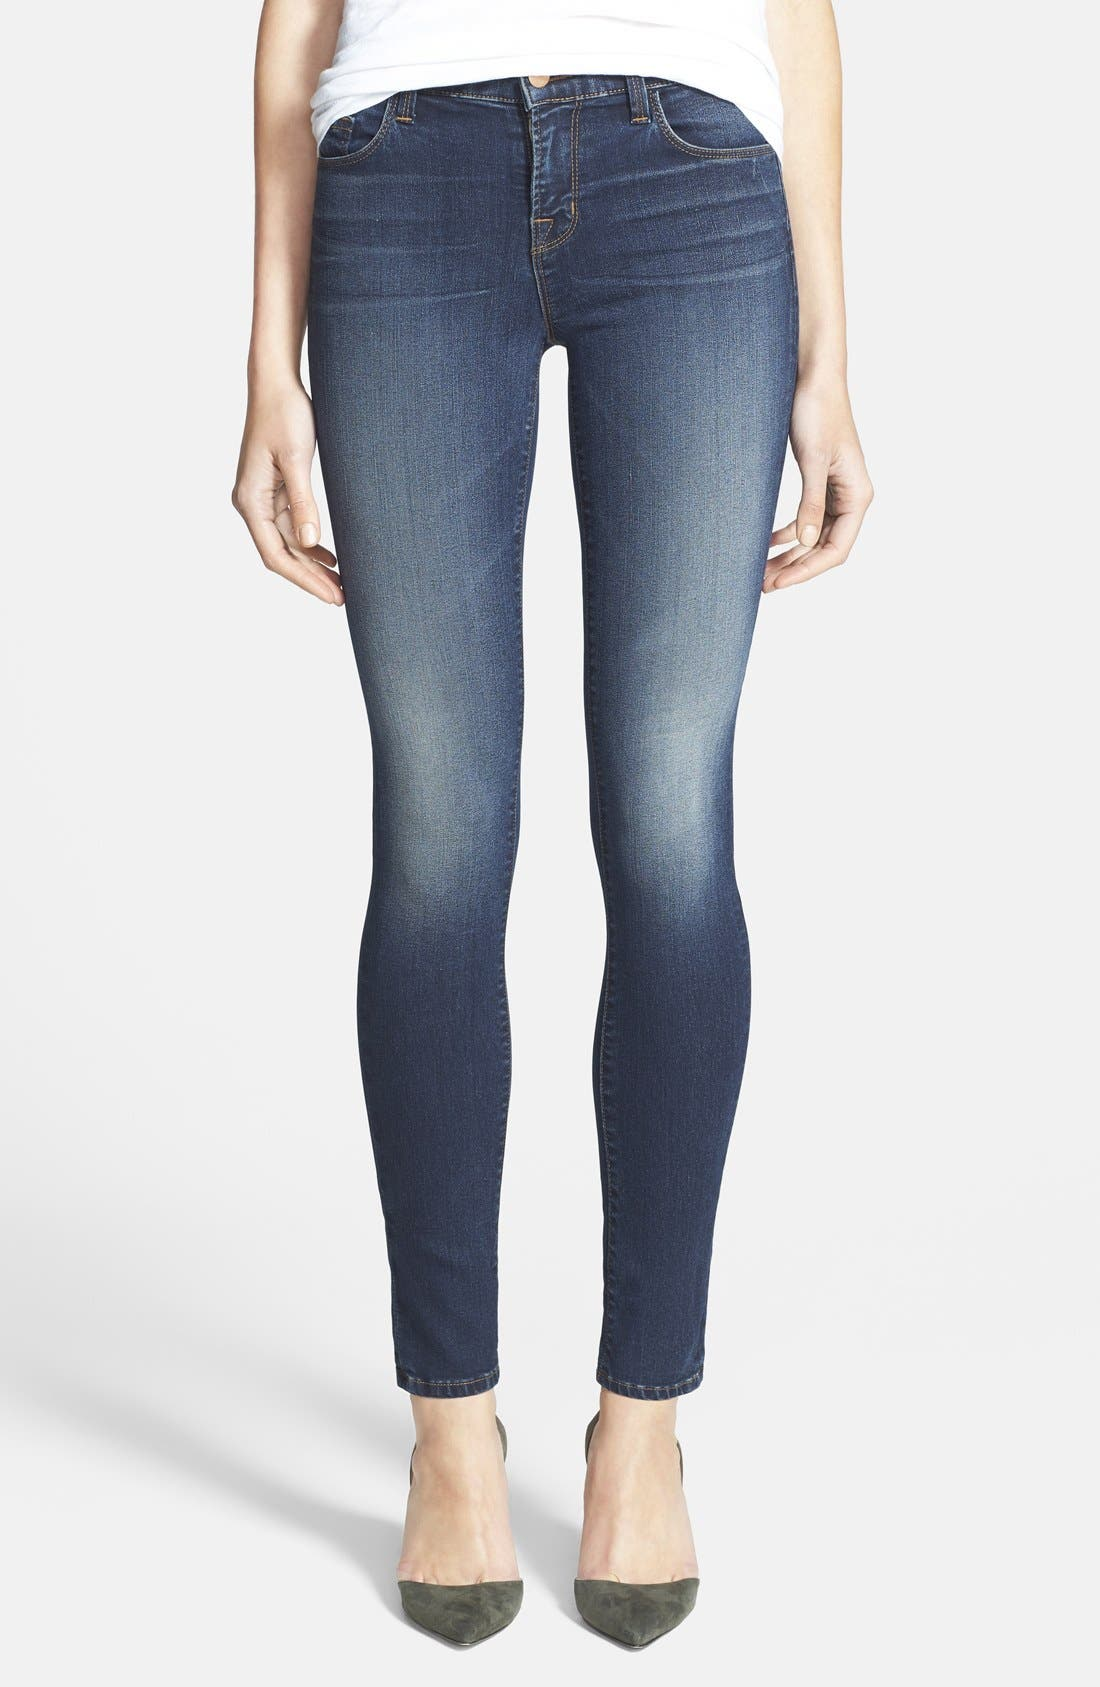 Alternate Image 1 Selected - J Brand '8112 Mid Rise Rail' Skinny Jeans (Venture)